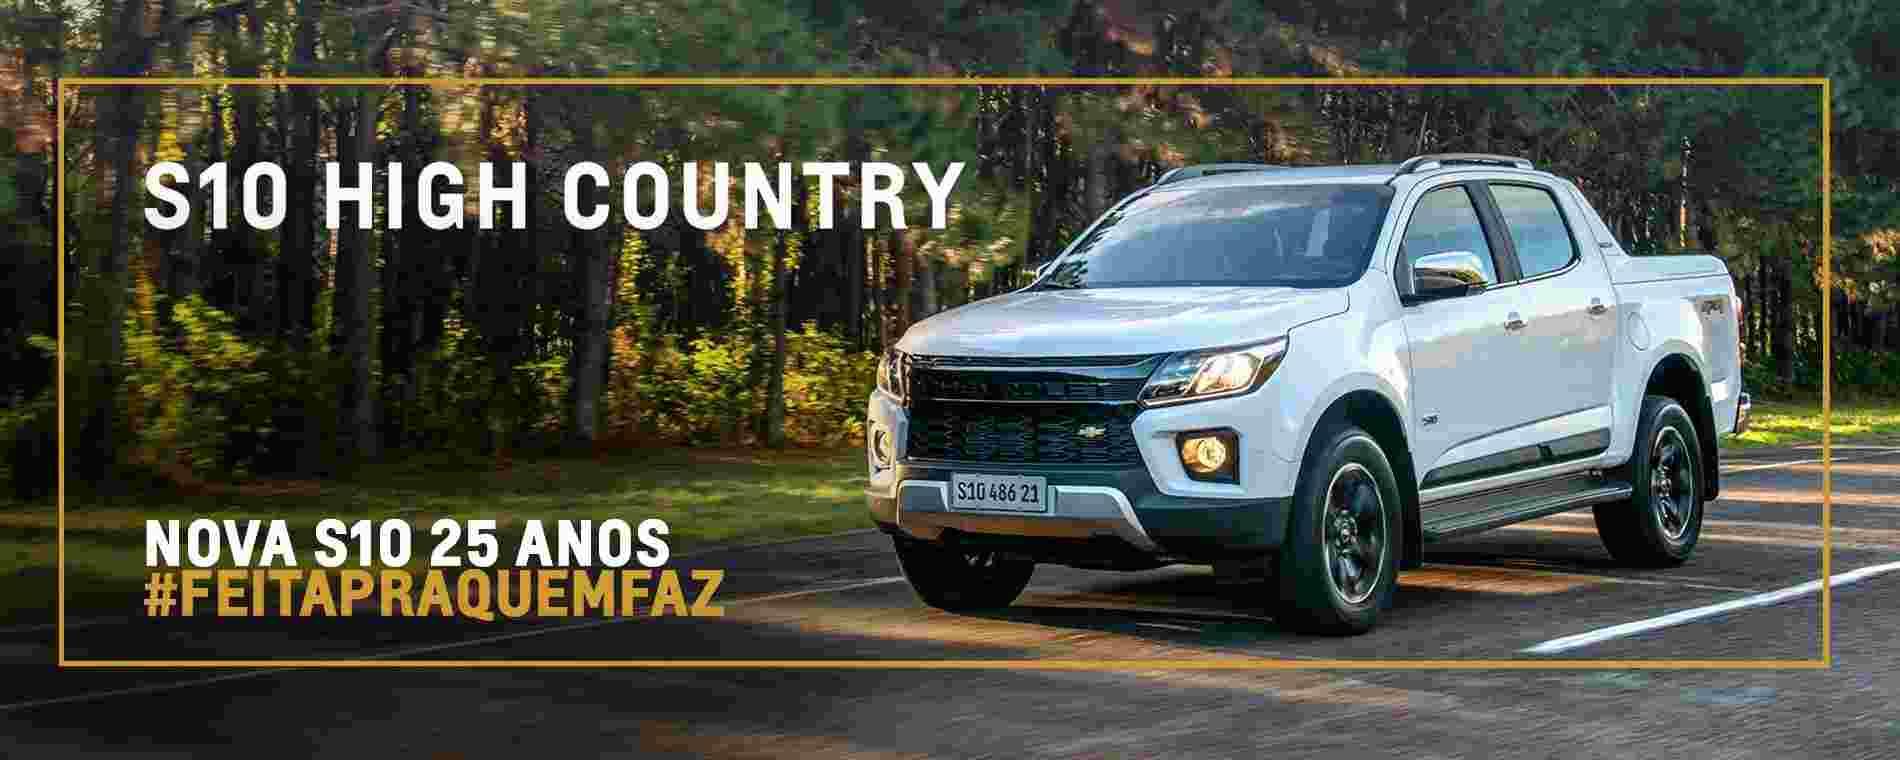 Peca Chevrolet Loja De Pecas Automotivas Online Da Brozauto